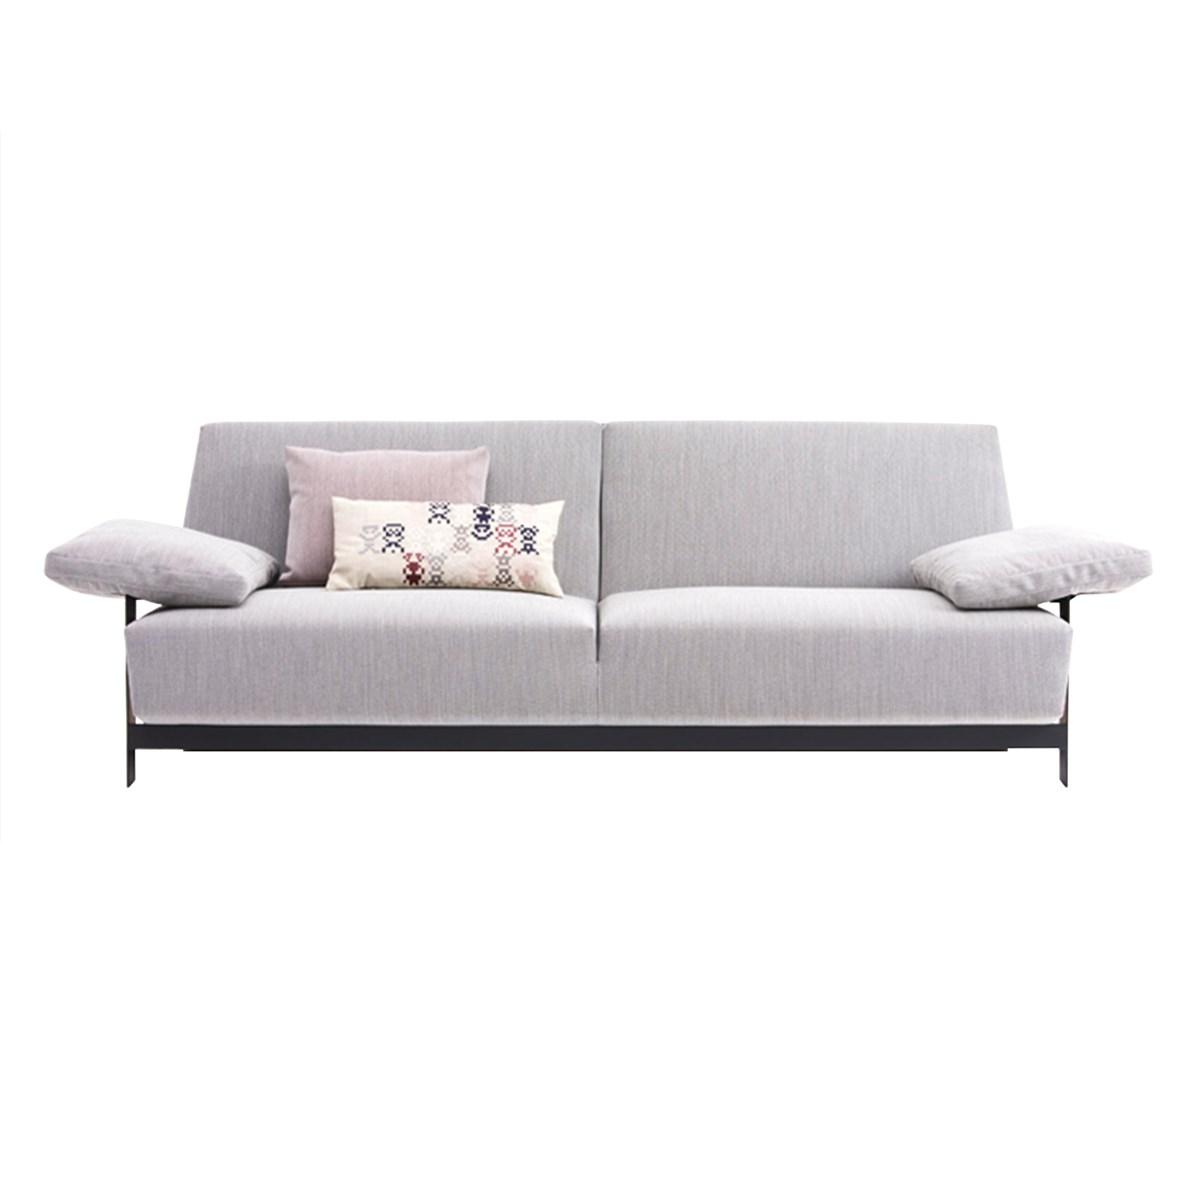 Moroso-Patricia-Urquiola-Silver-Lake-Sofa-Matisse-1